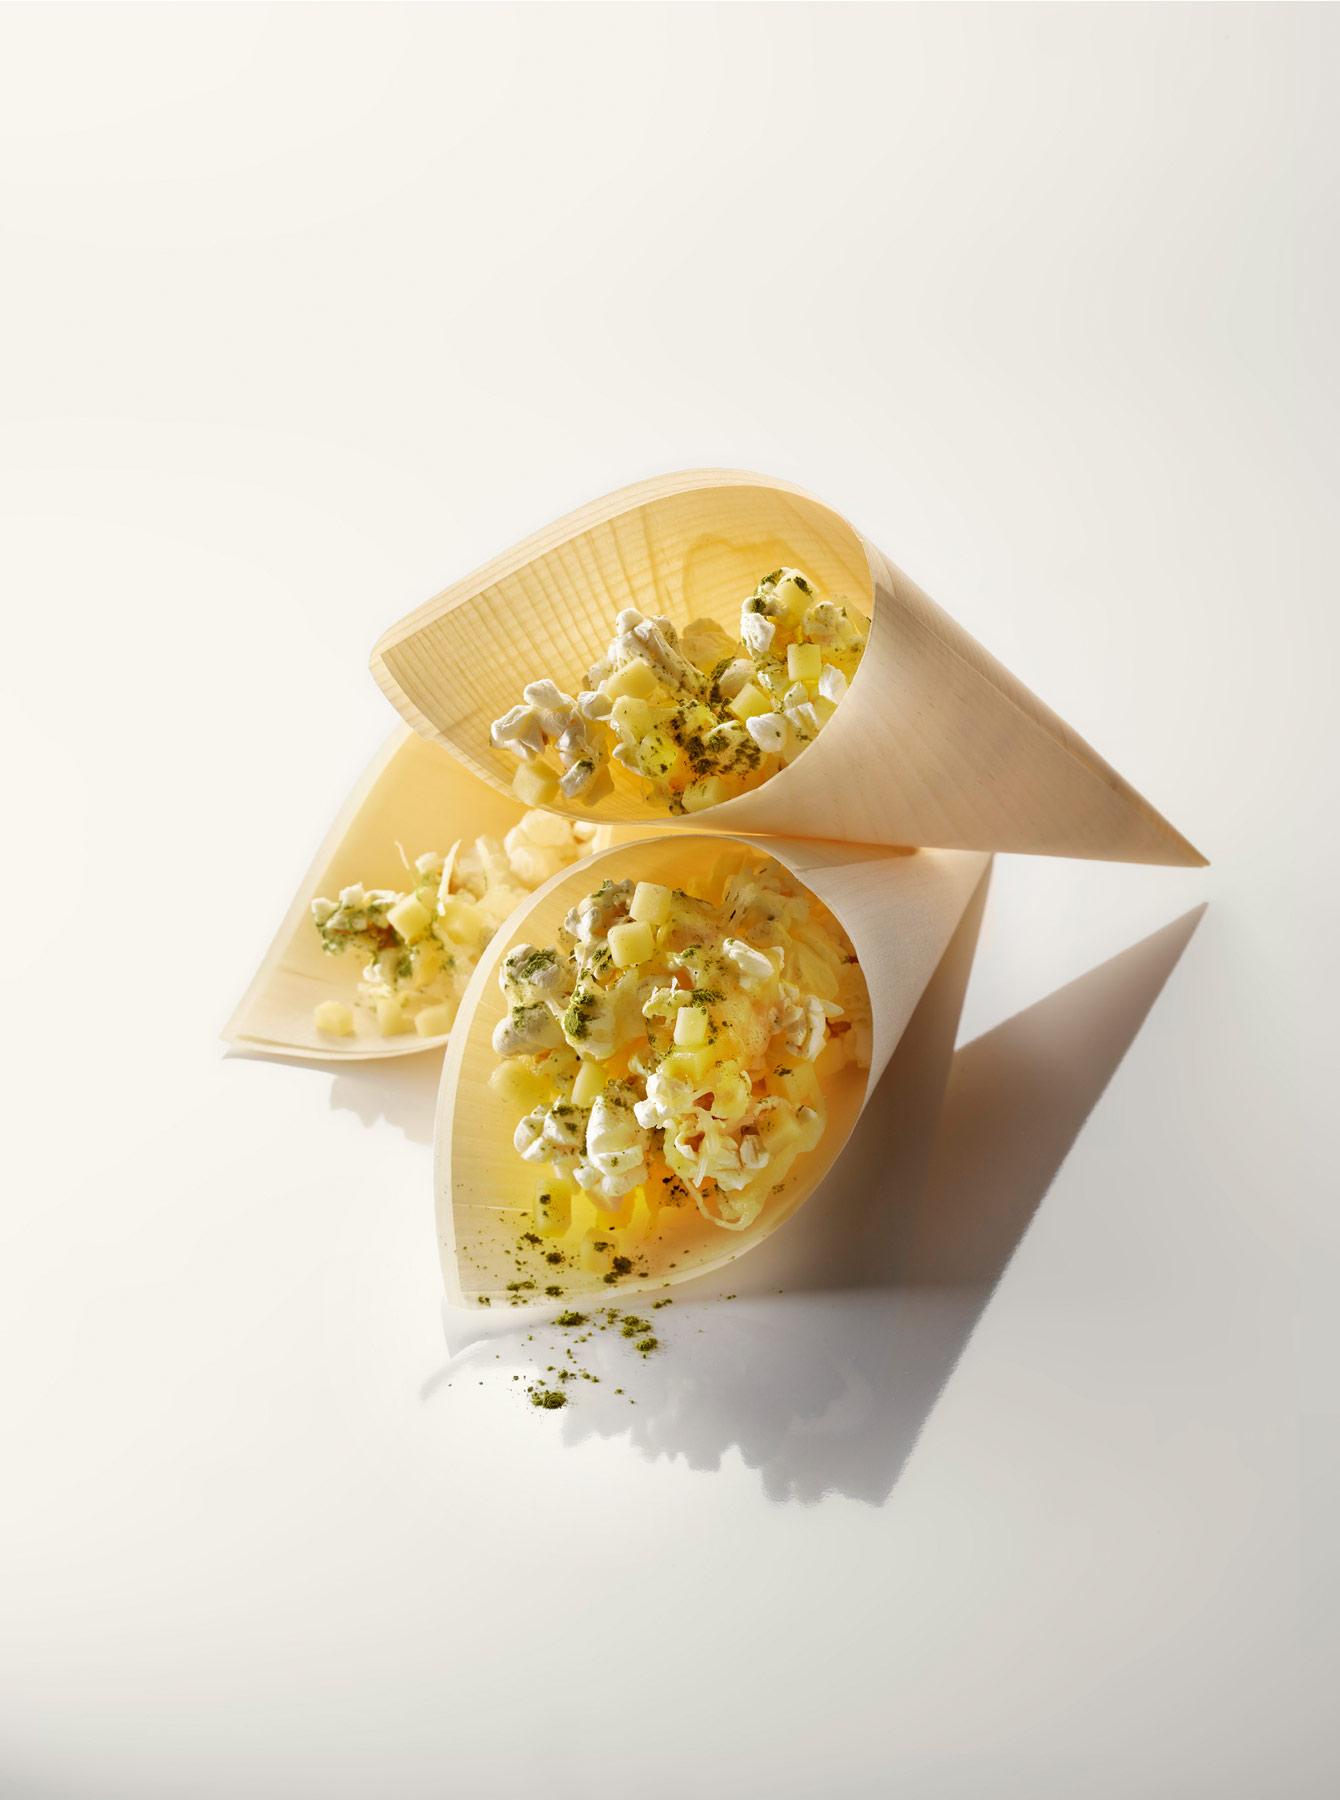 Studio Photographe Culinaire - Sylvain Madelon